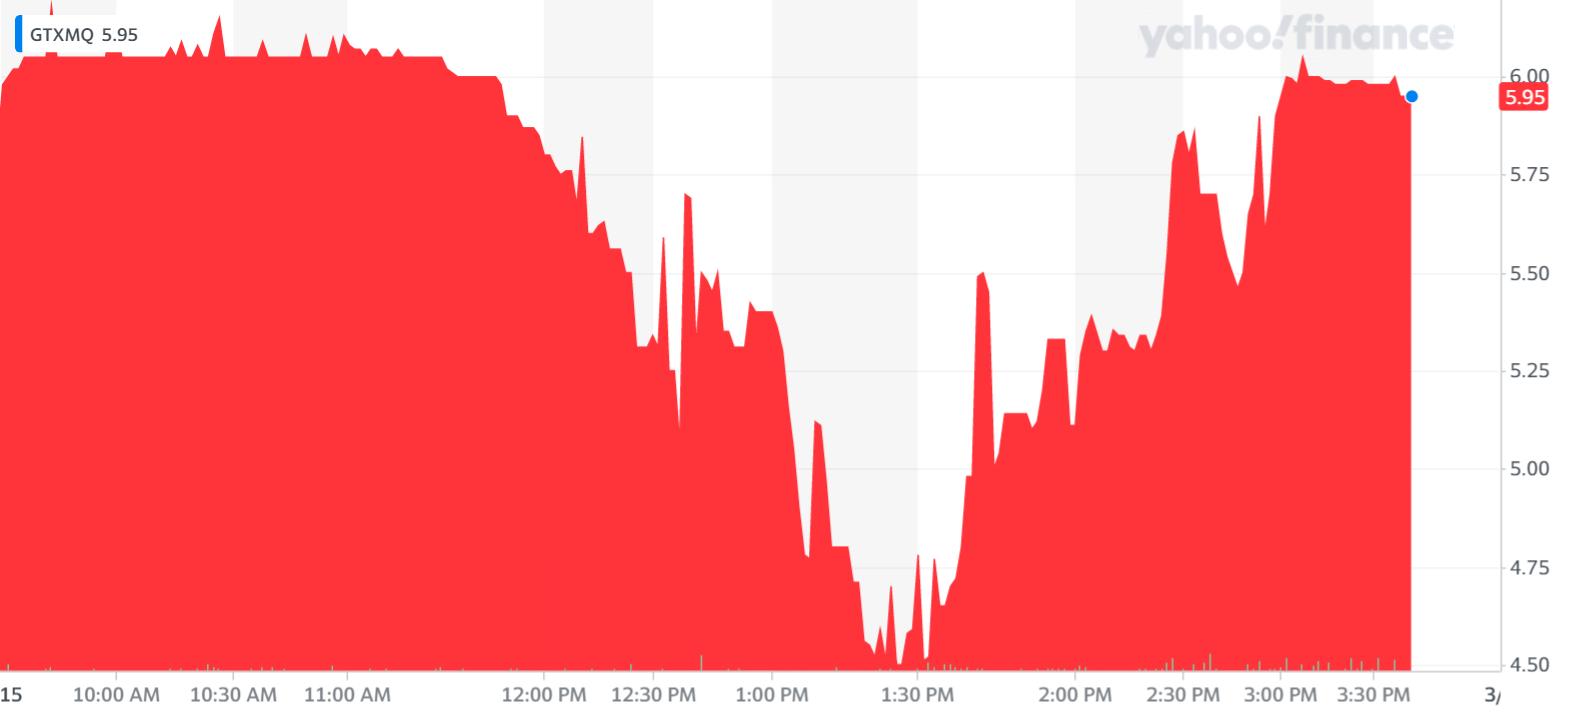 Garrett Motion Inc price graph